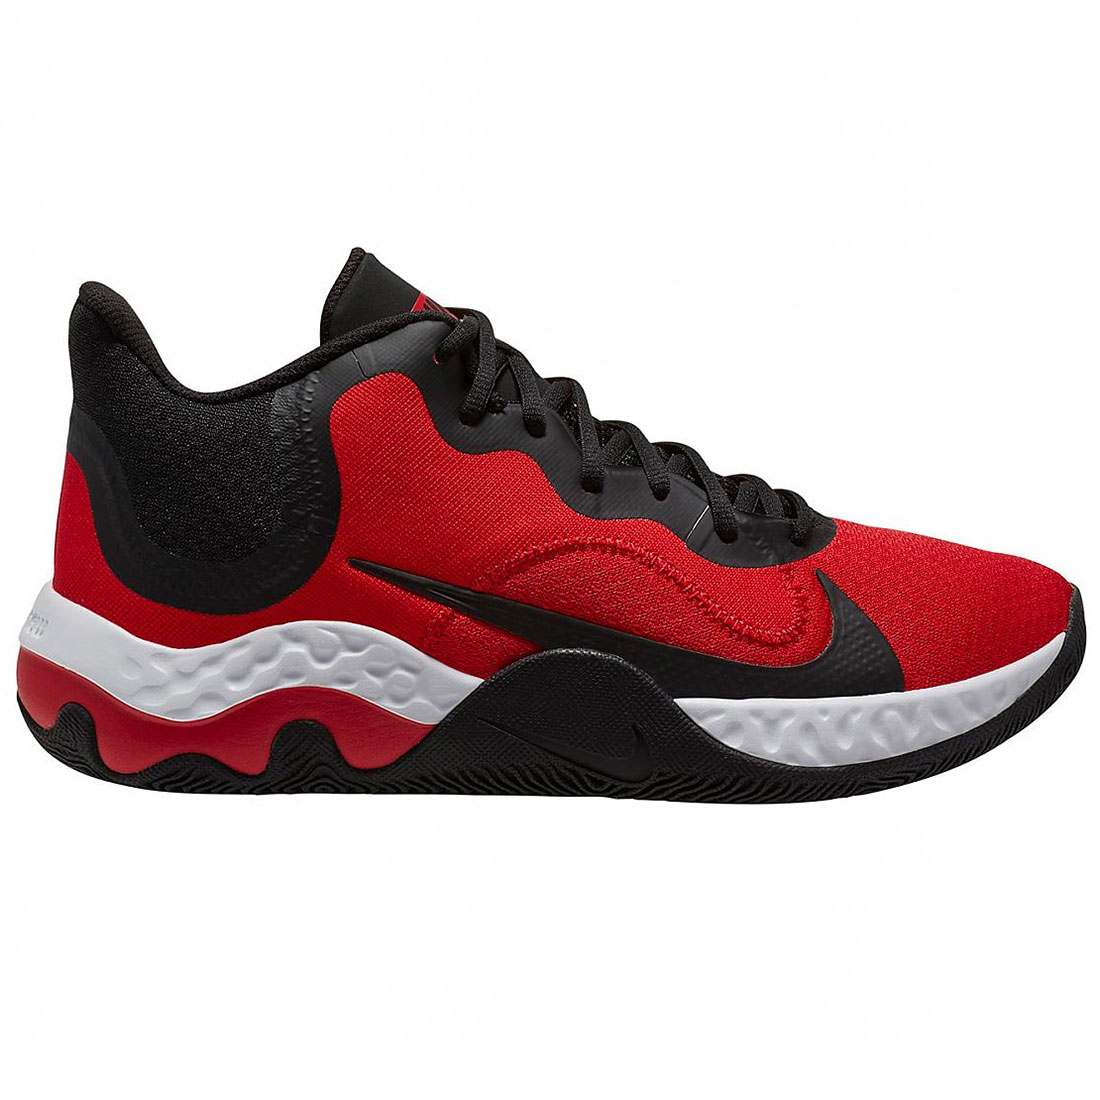 Nike Renew Elevate Basketballschuhe schwarz rot CK2669 600